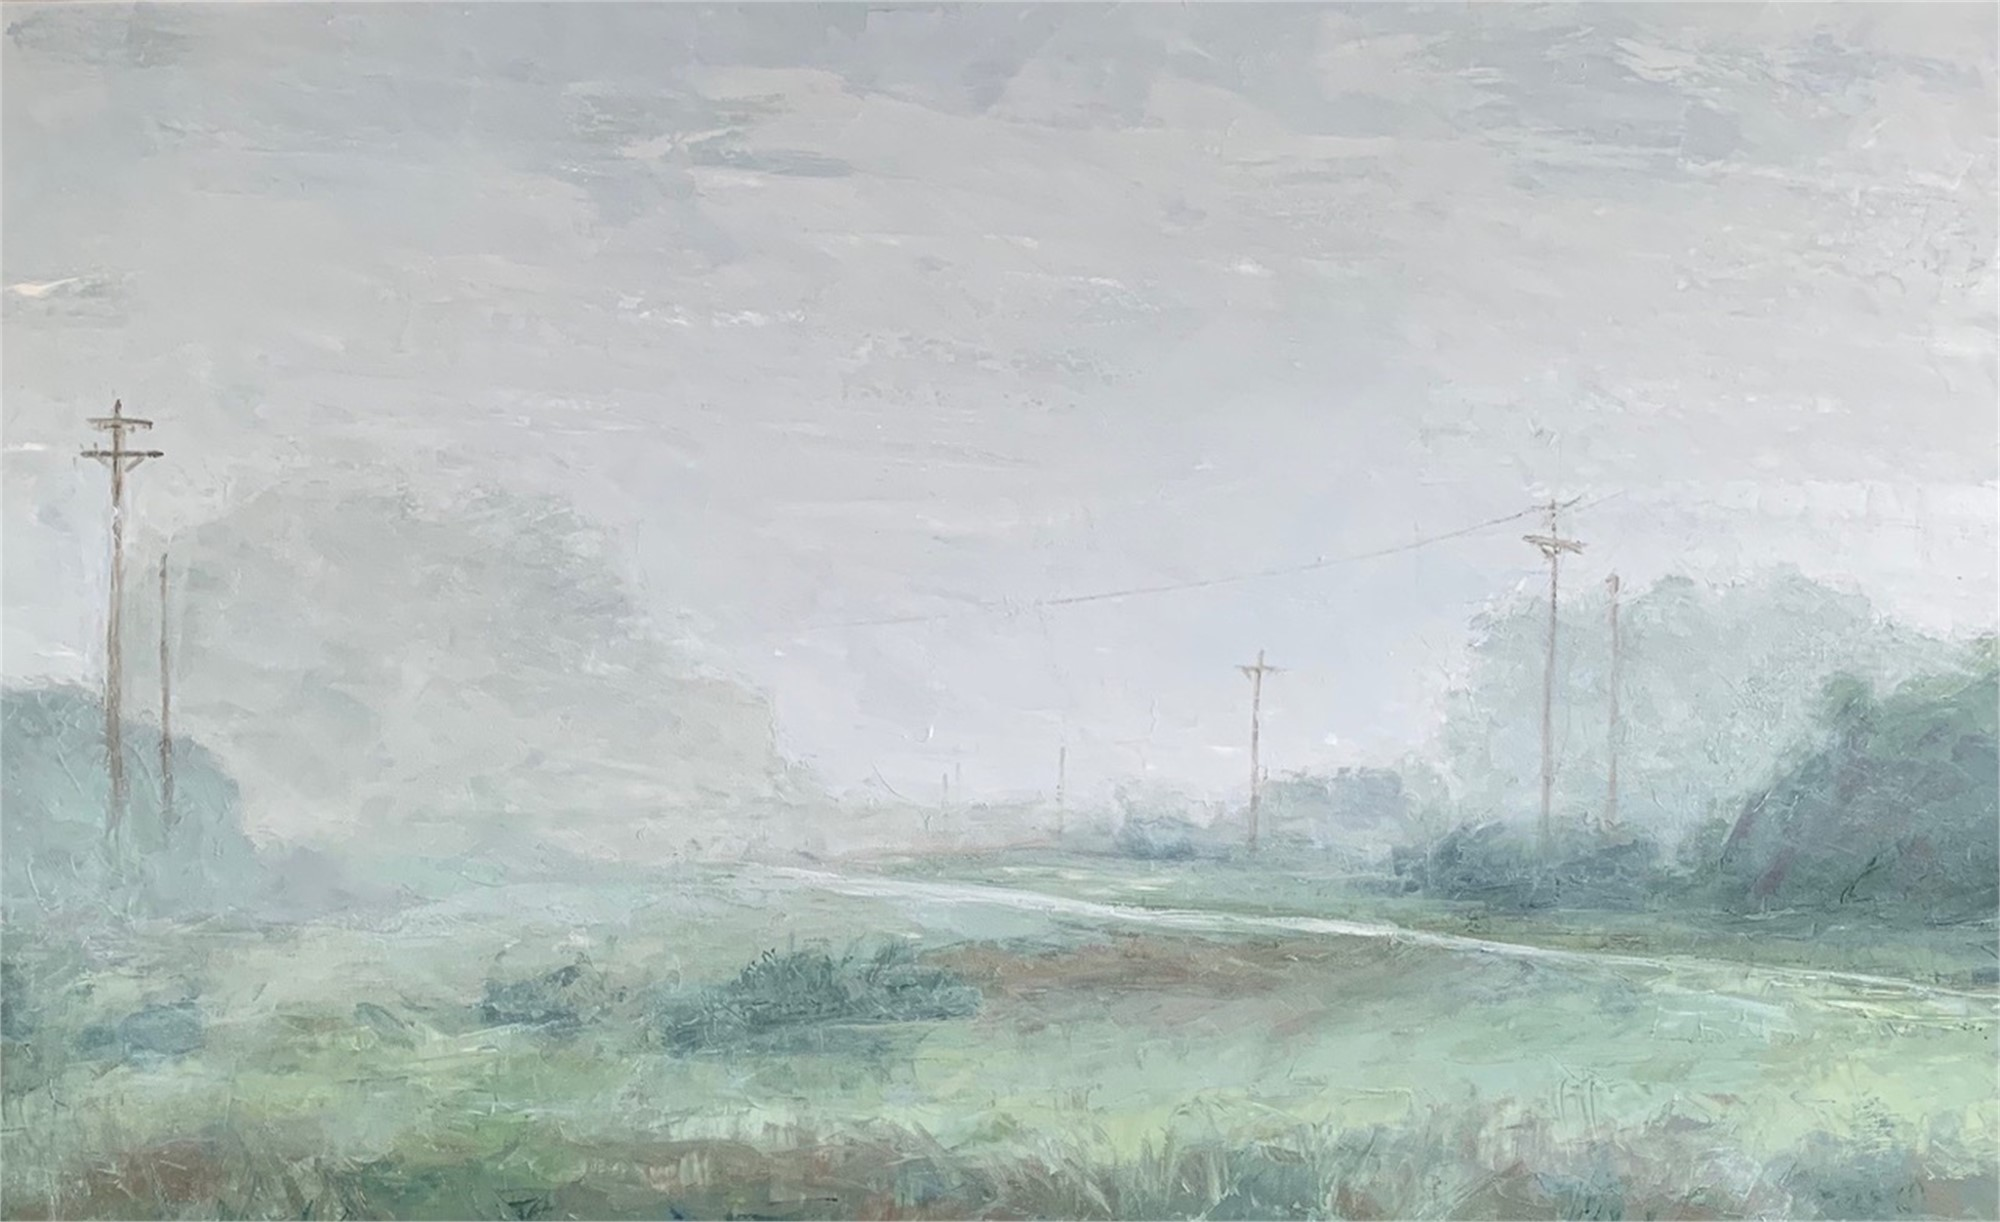 Road to La Grange by Susu Meyer